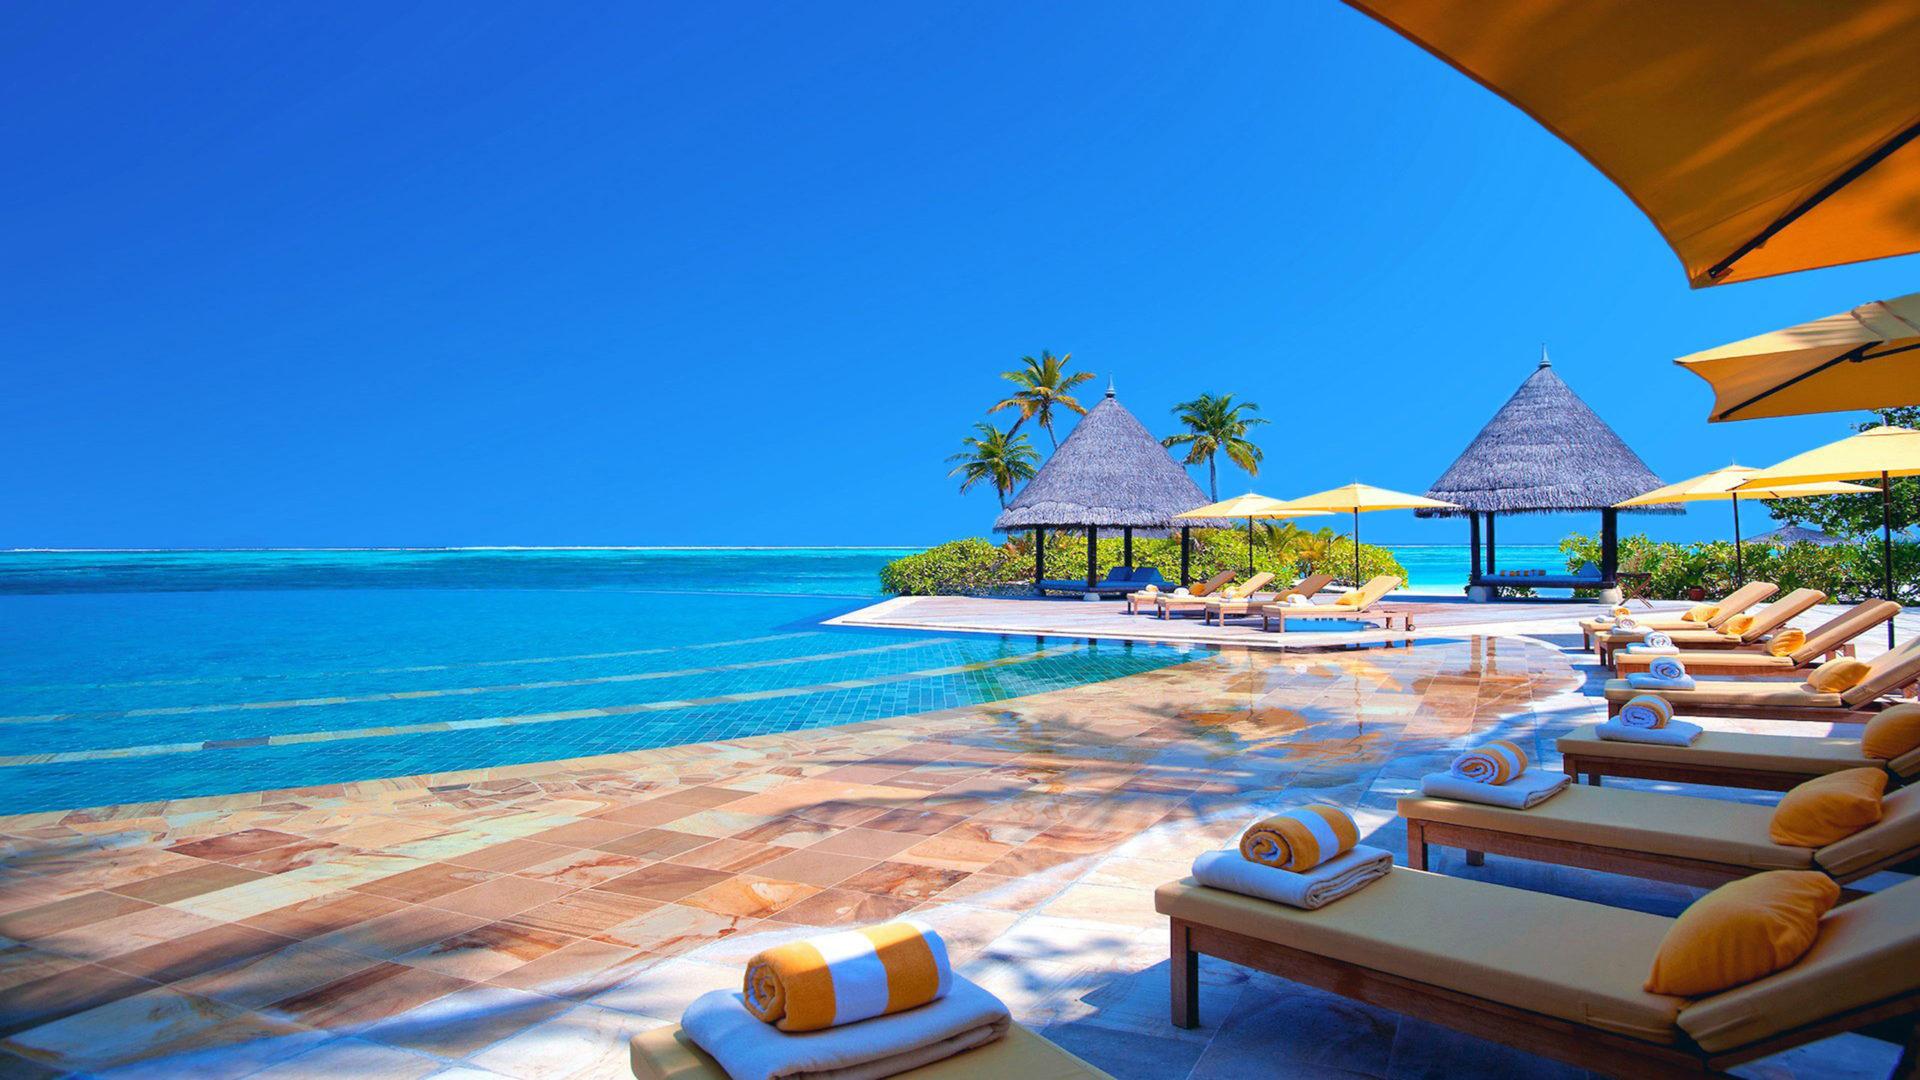 Surfer Girl Wallpaper 1440x900 Hotel Terrace Chairs Ocean Maldives Hd Wallpaper 2560x1440